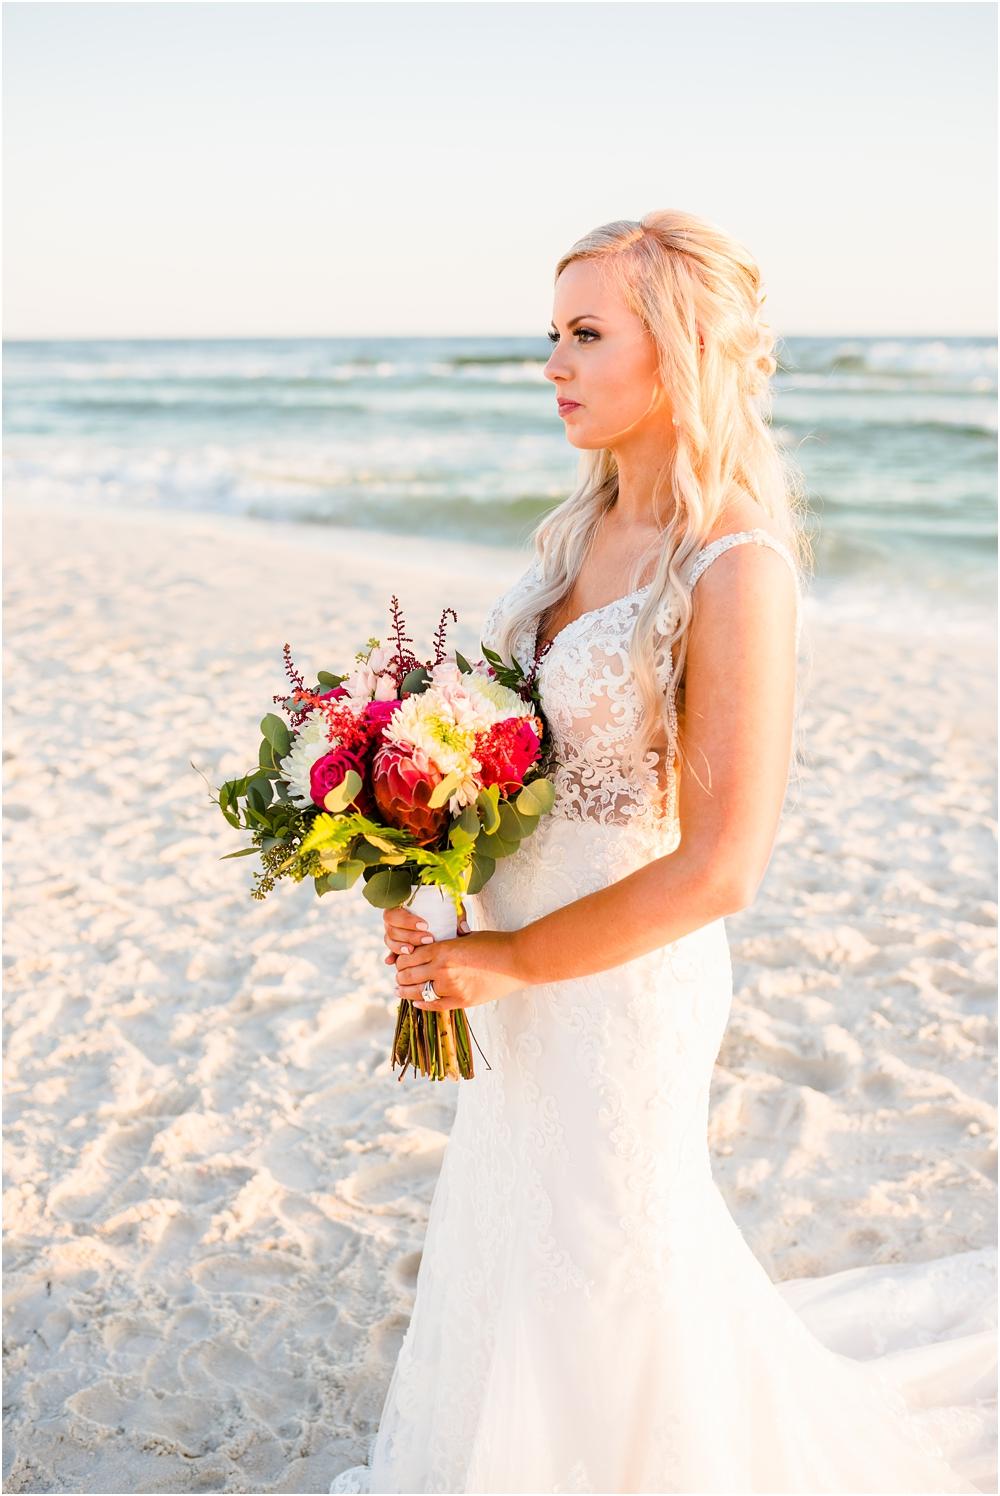 mcglothlin-wedding-kiersten-stevenson-photography-30a-panama-city-beach-dothan-tallahassee-(99-of-145).jpg